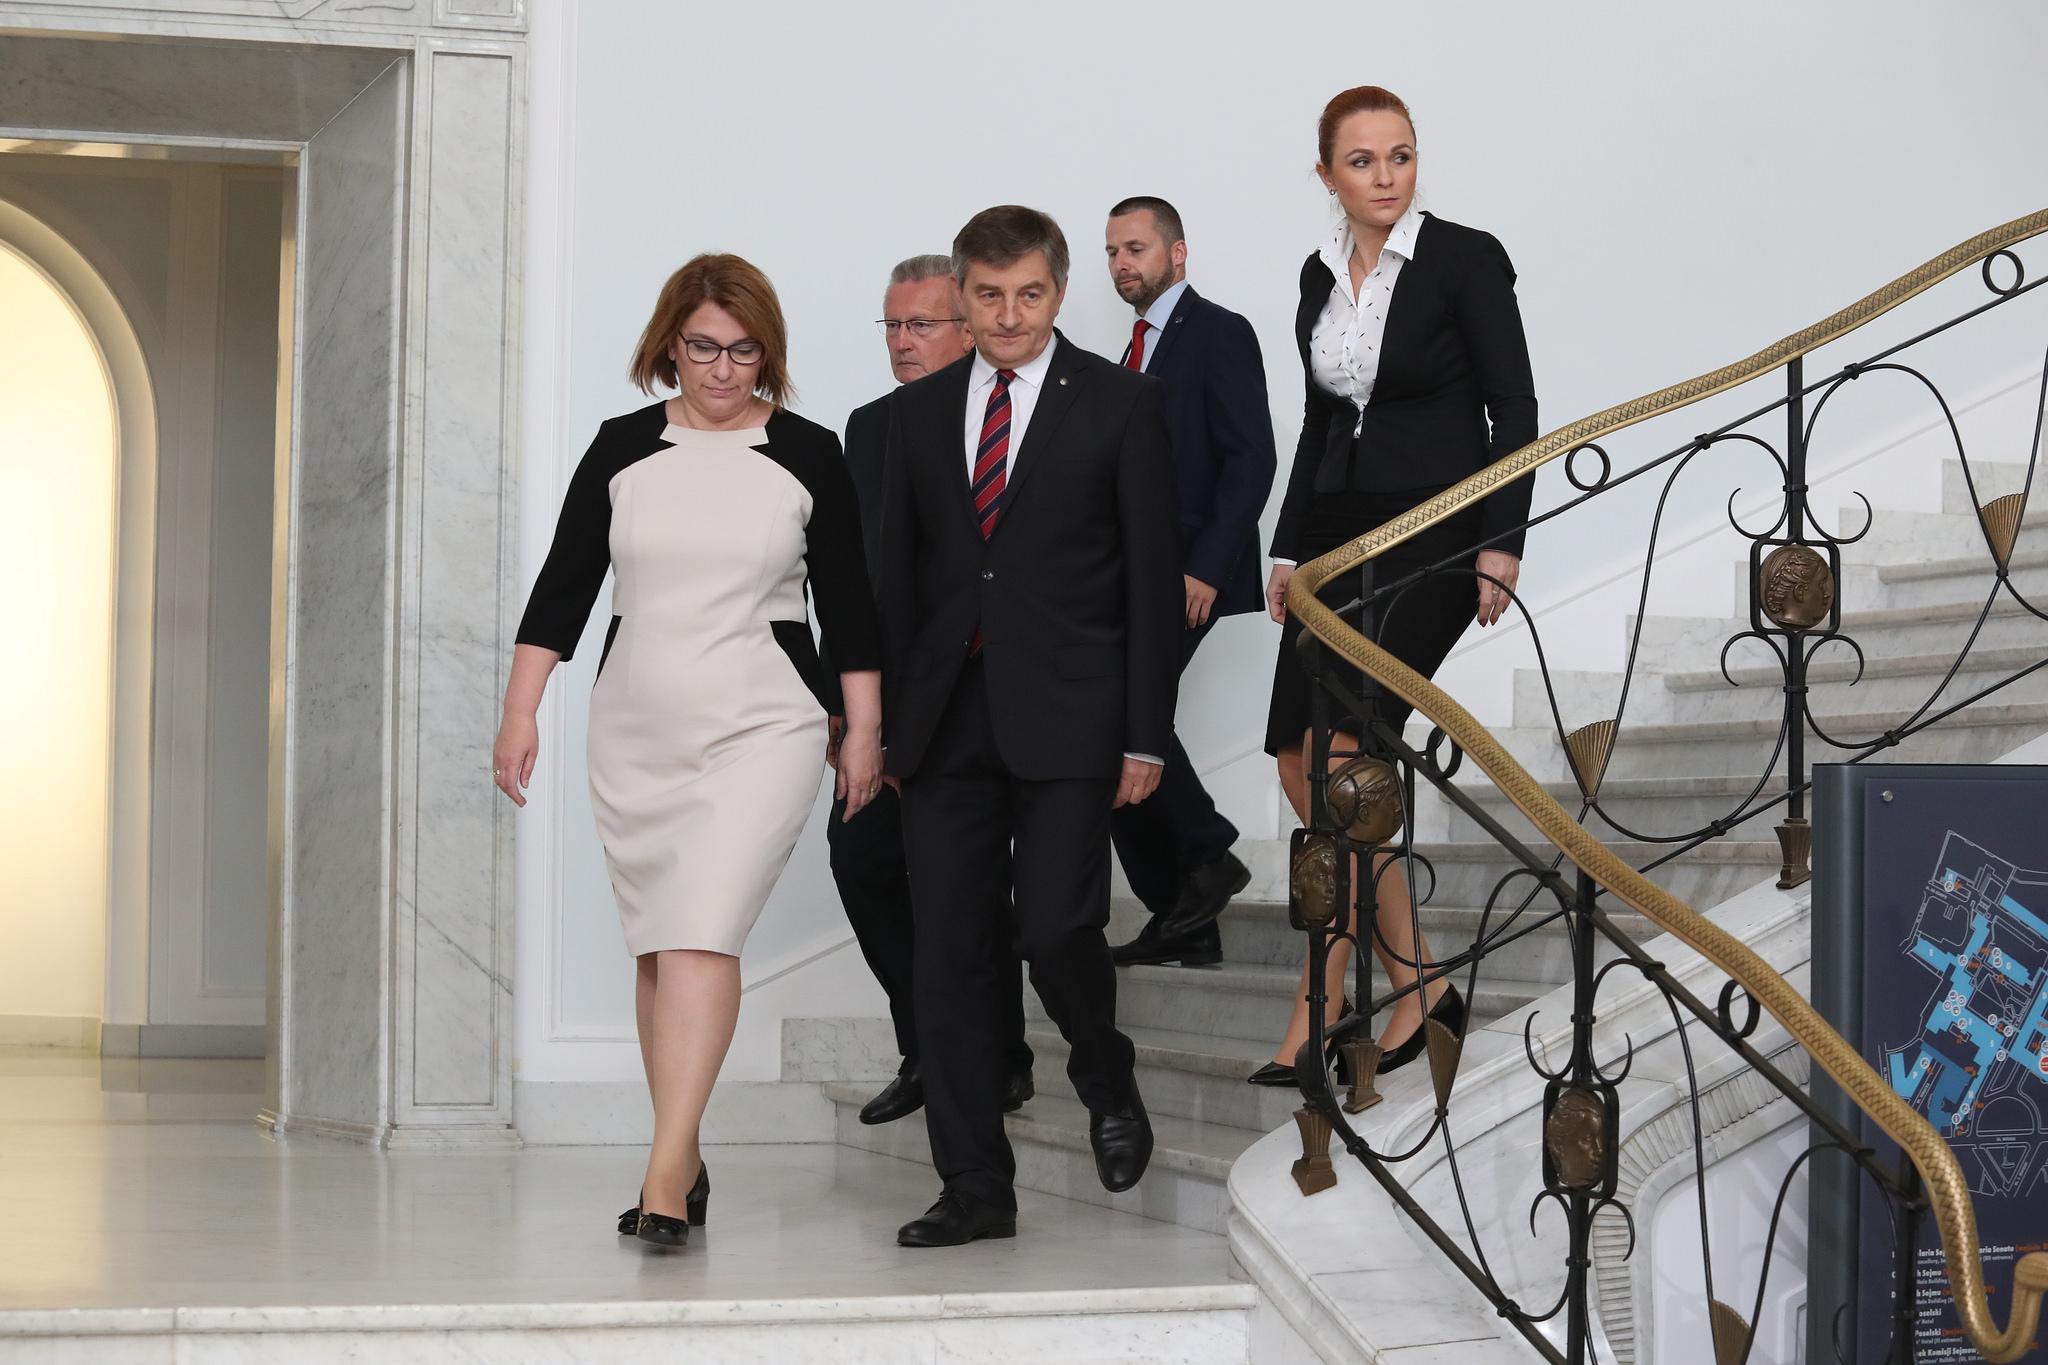 Marszałek Sejmu Marek Kuchciński i wicemarszałek Sejmu Beata Mazurek, politycy PiS (fot. Paweł Kula/Kancelaria Sejmu RP/flickr.com/CC BY 2.0)